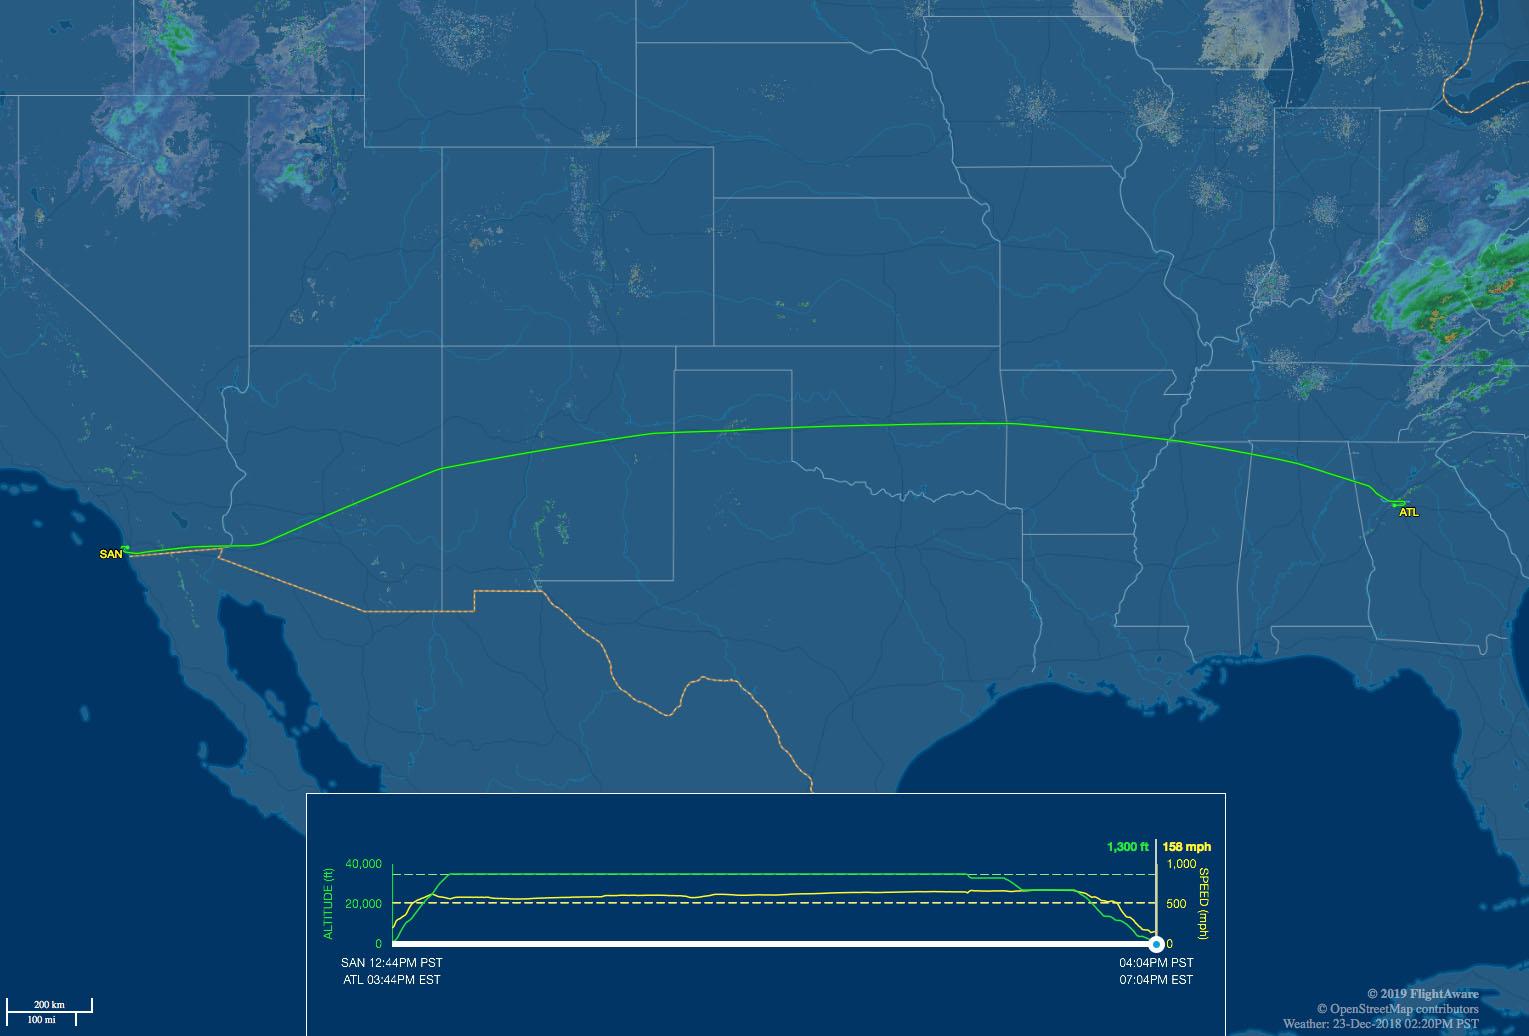 SAN-ATL route map delta 767-400